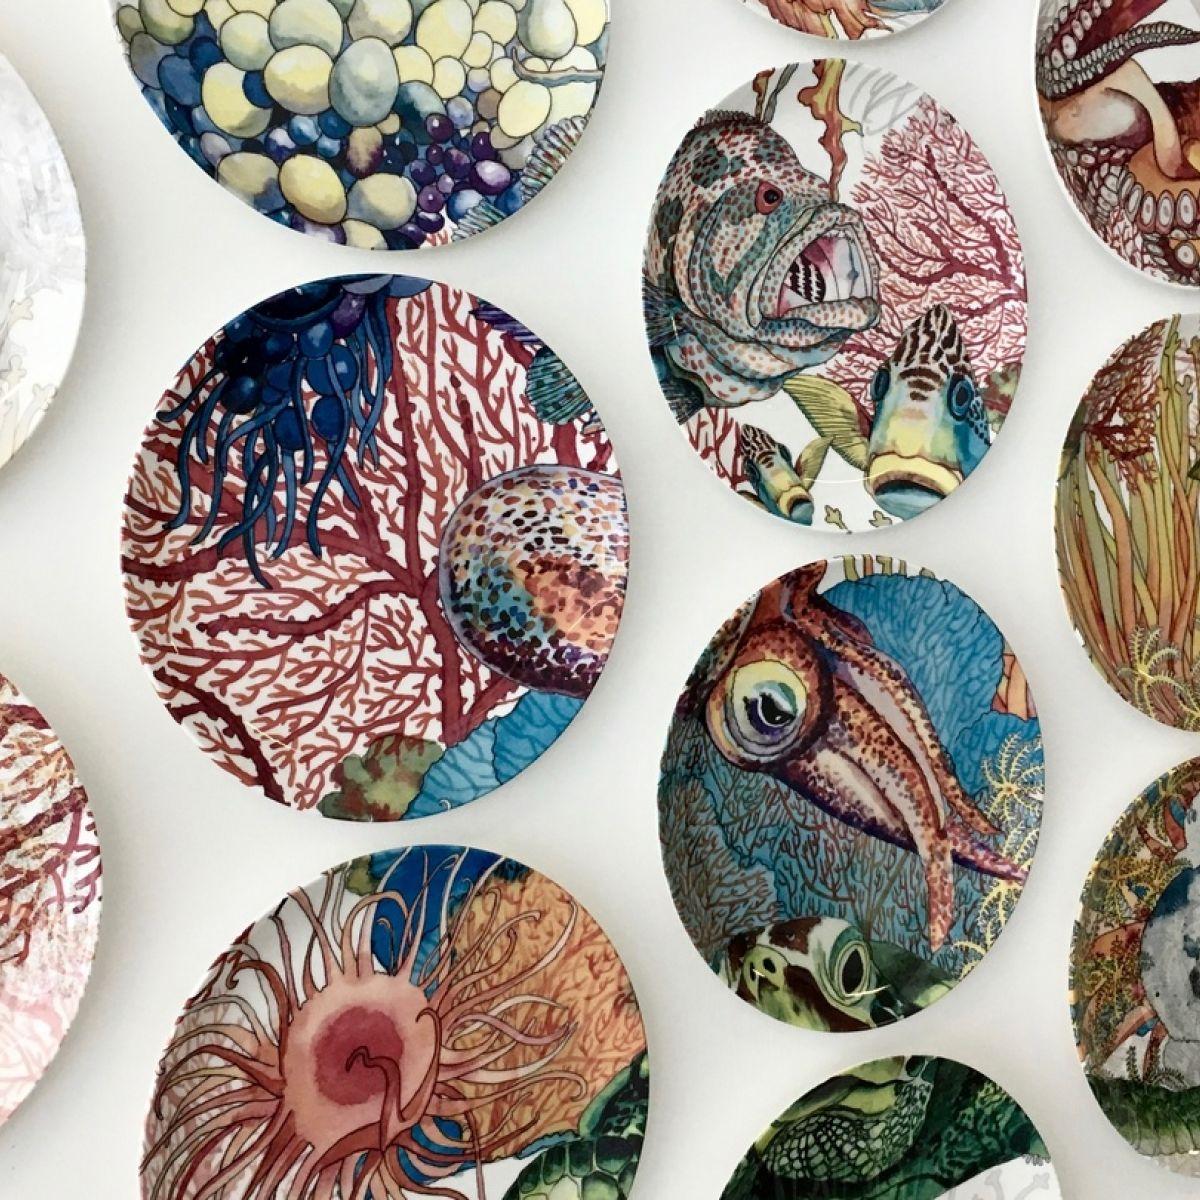 Dublin Castle Ceramics Show Throws Some New Shapes